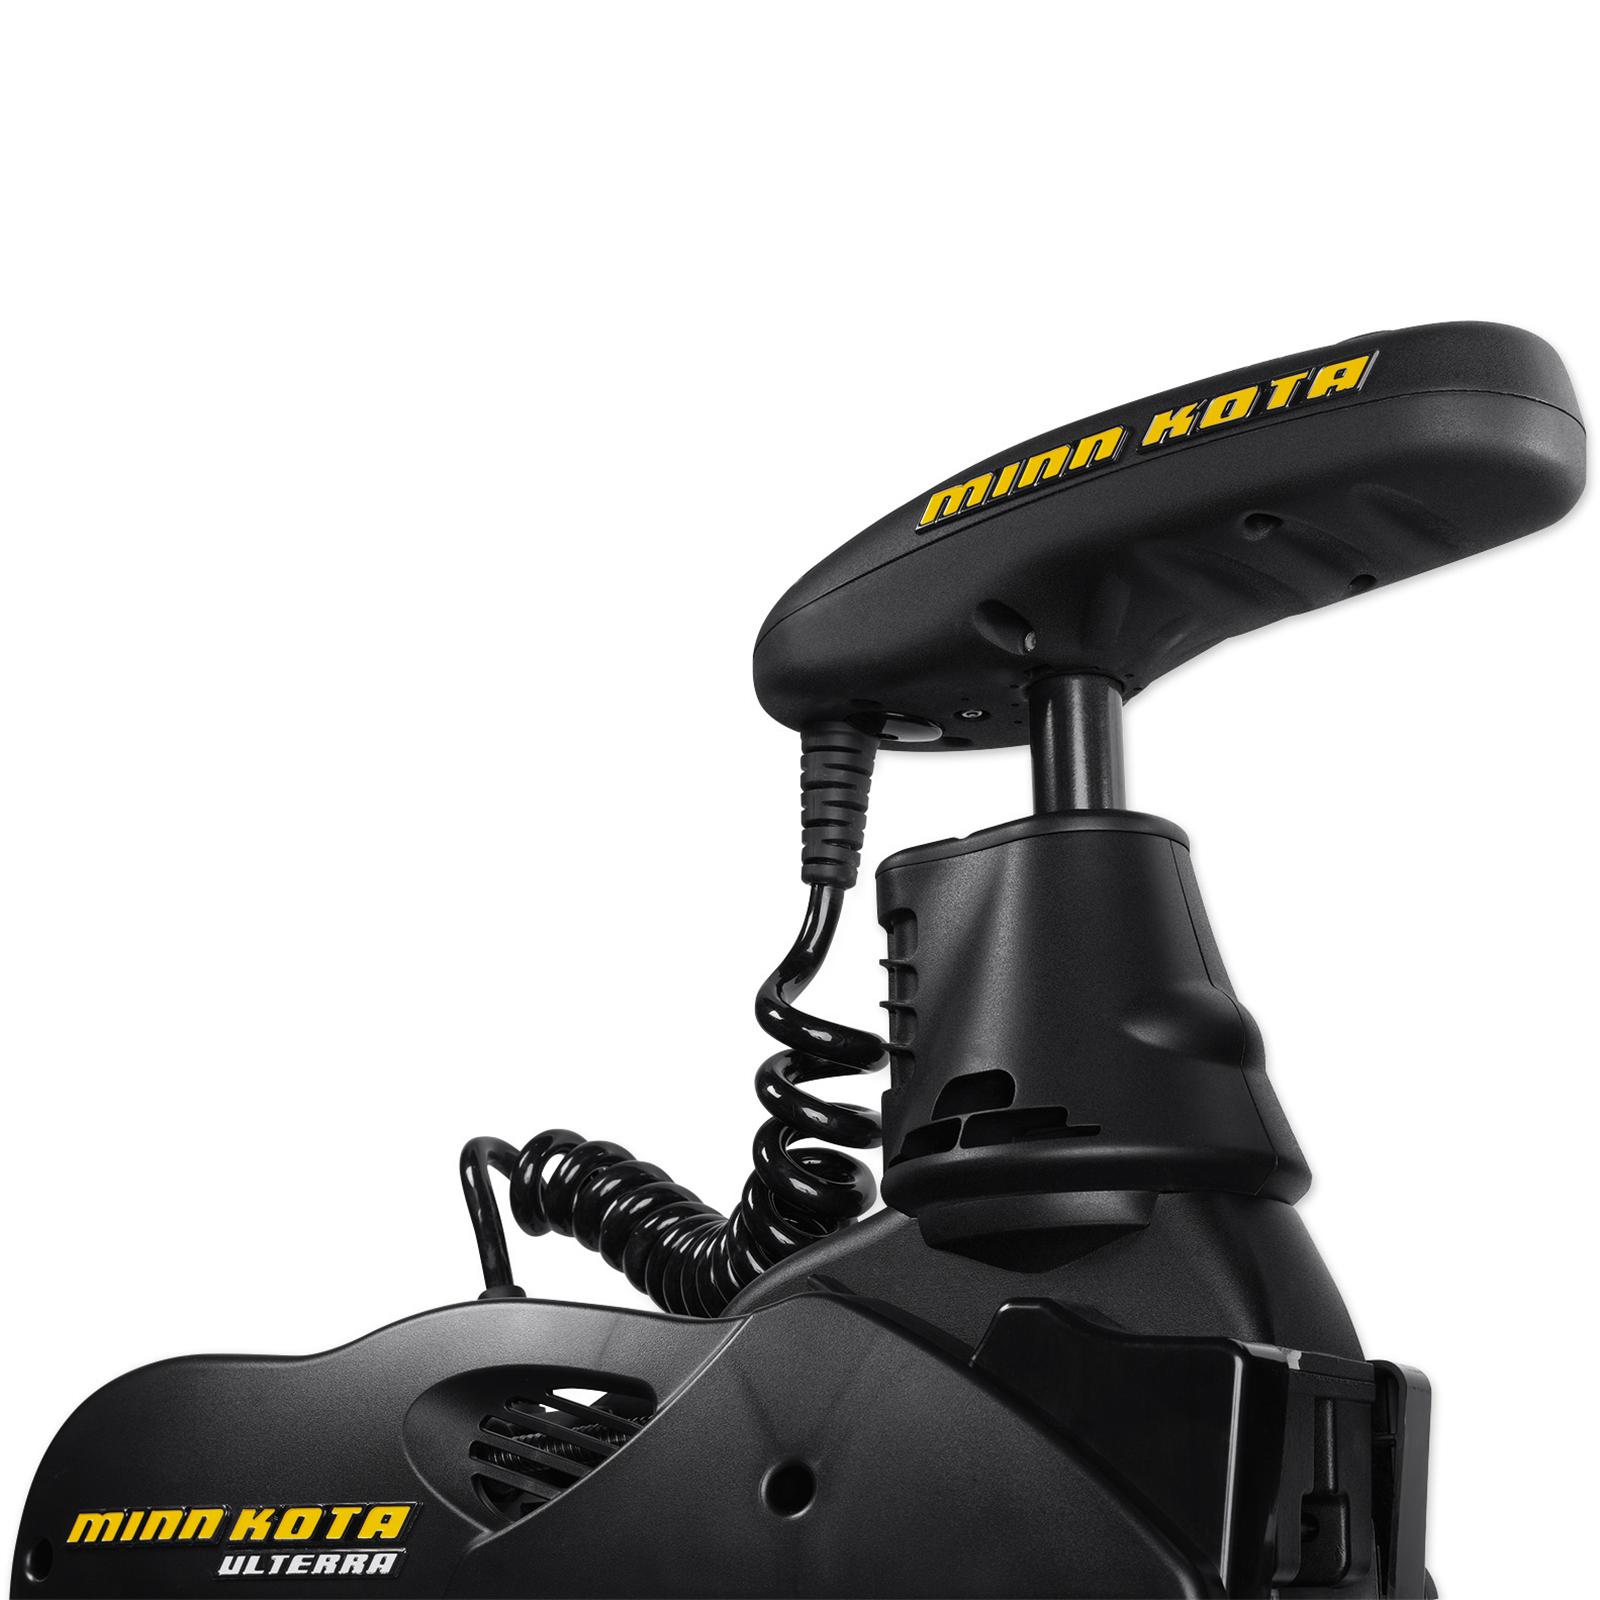 Minn Kota Ulterra i-Pilot Bluetooth Freshwater Trolling Motor